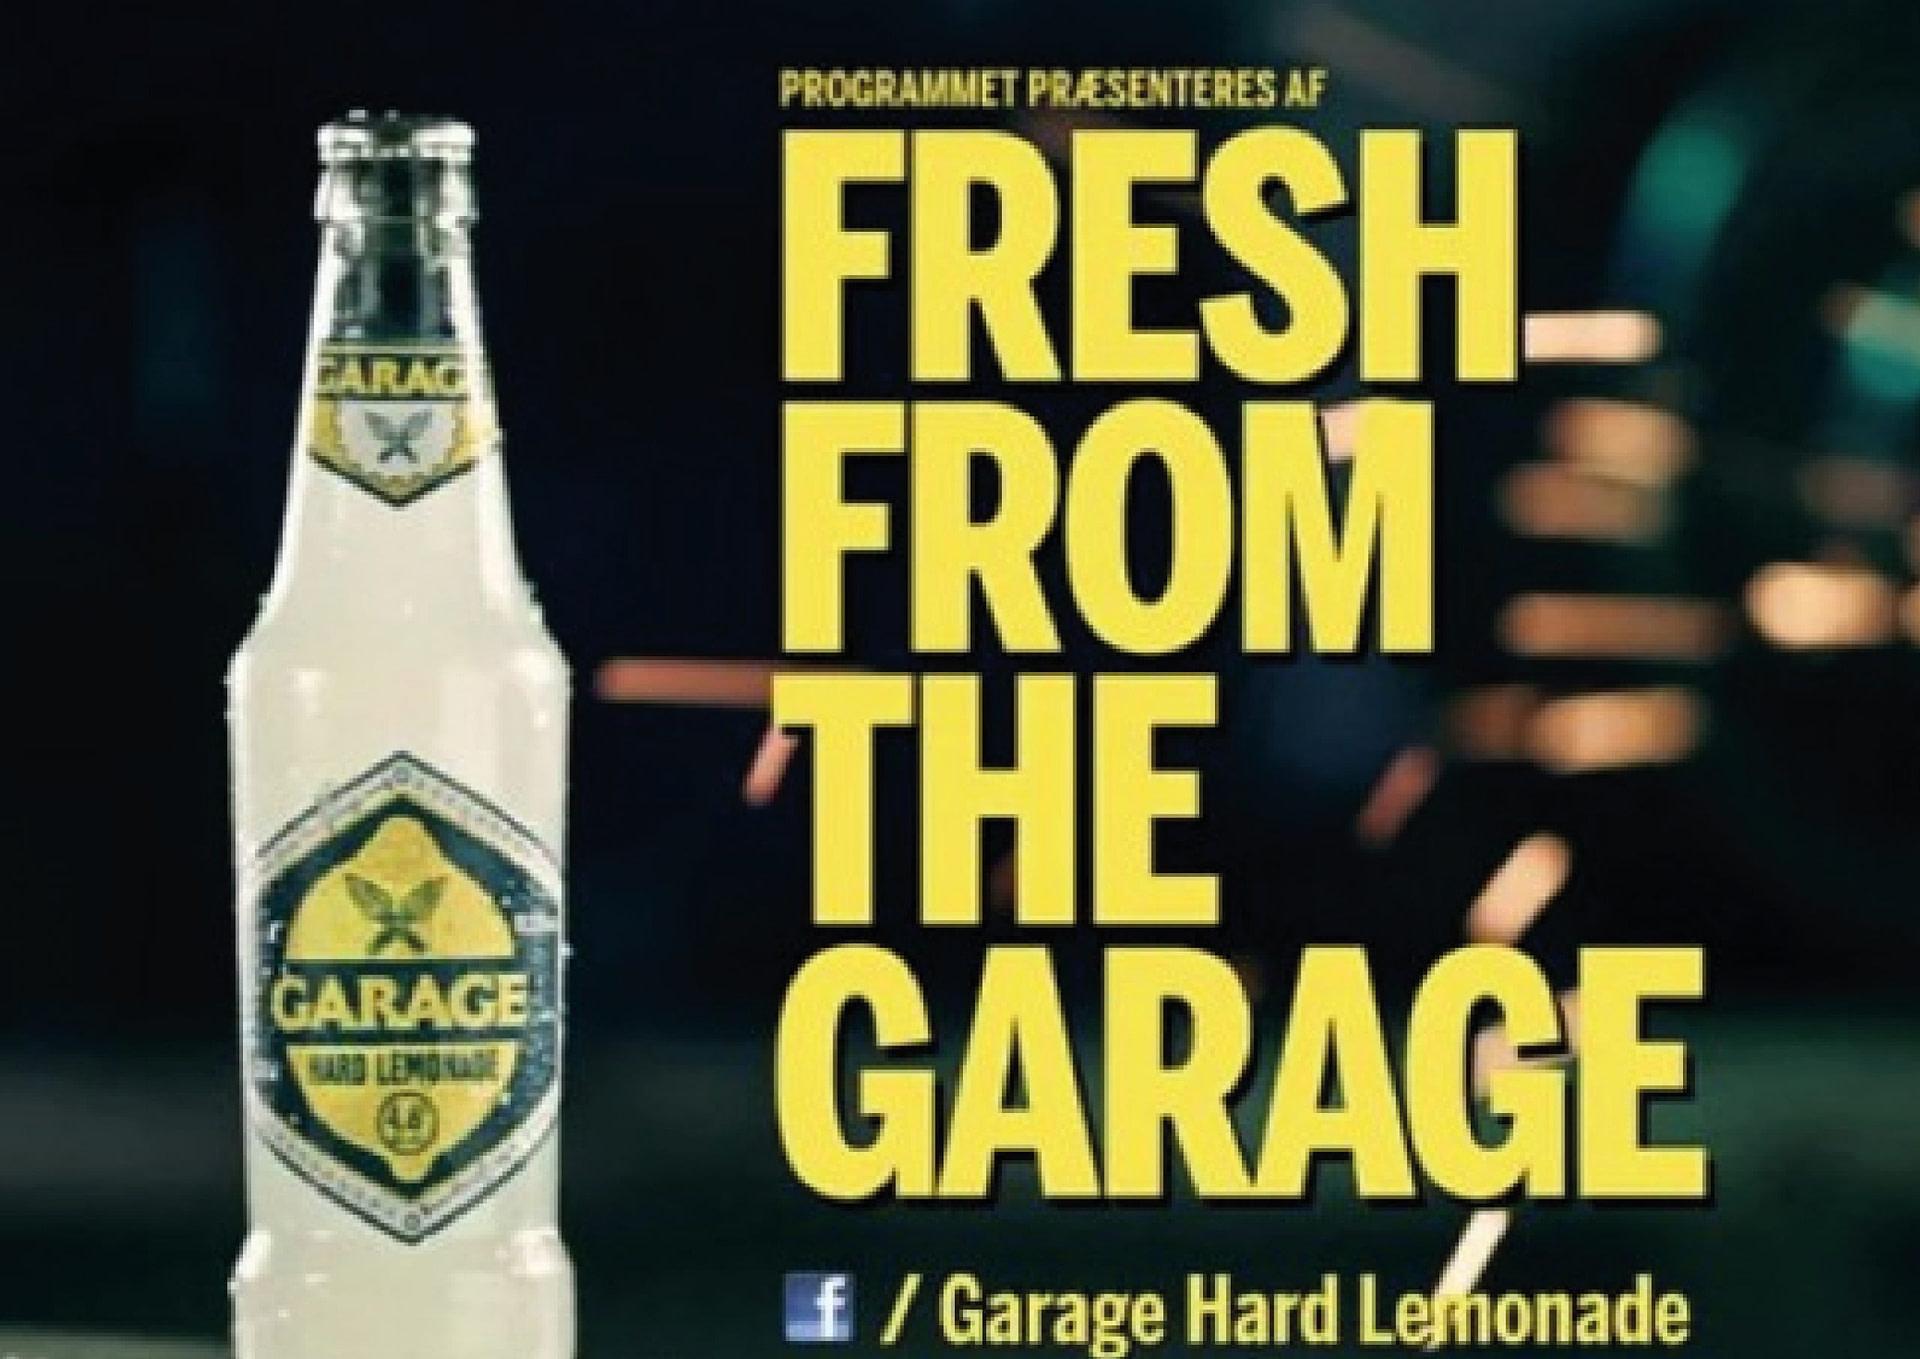 Garage Hard Lemonade from Carlsberg